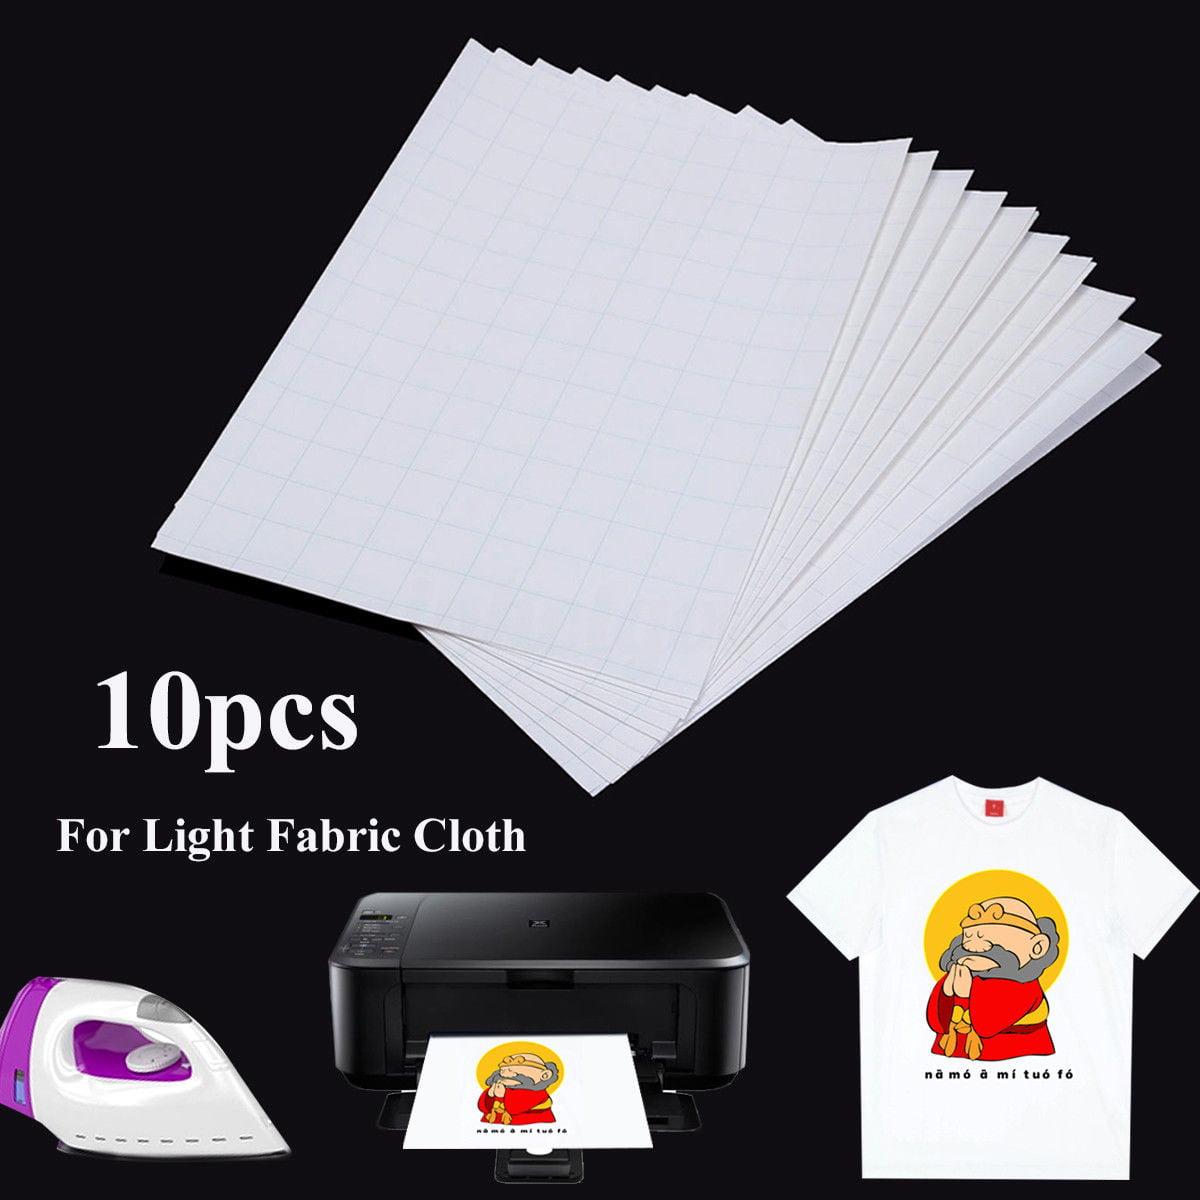 10Pcs A4 Iron On Inkjet Print Heat Press Transfer Paper Light Fabric T-Shirt